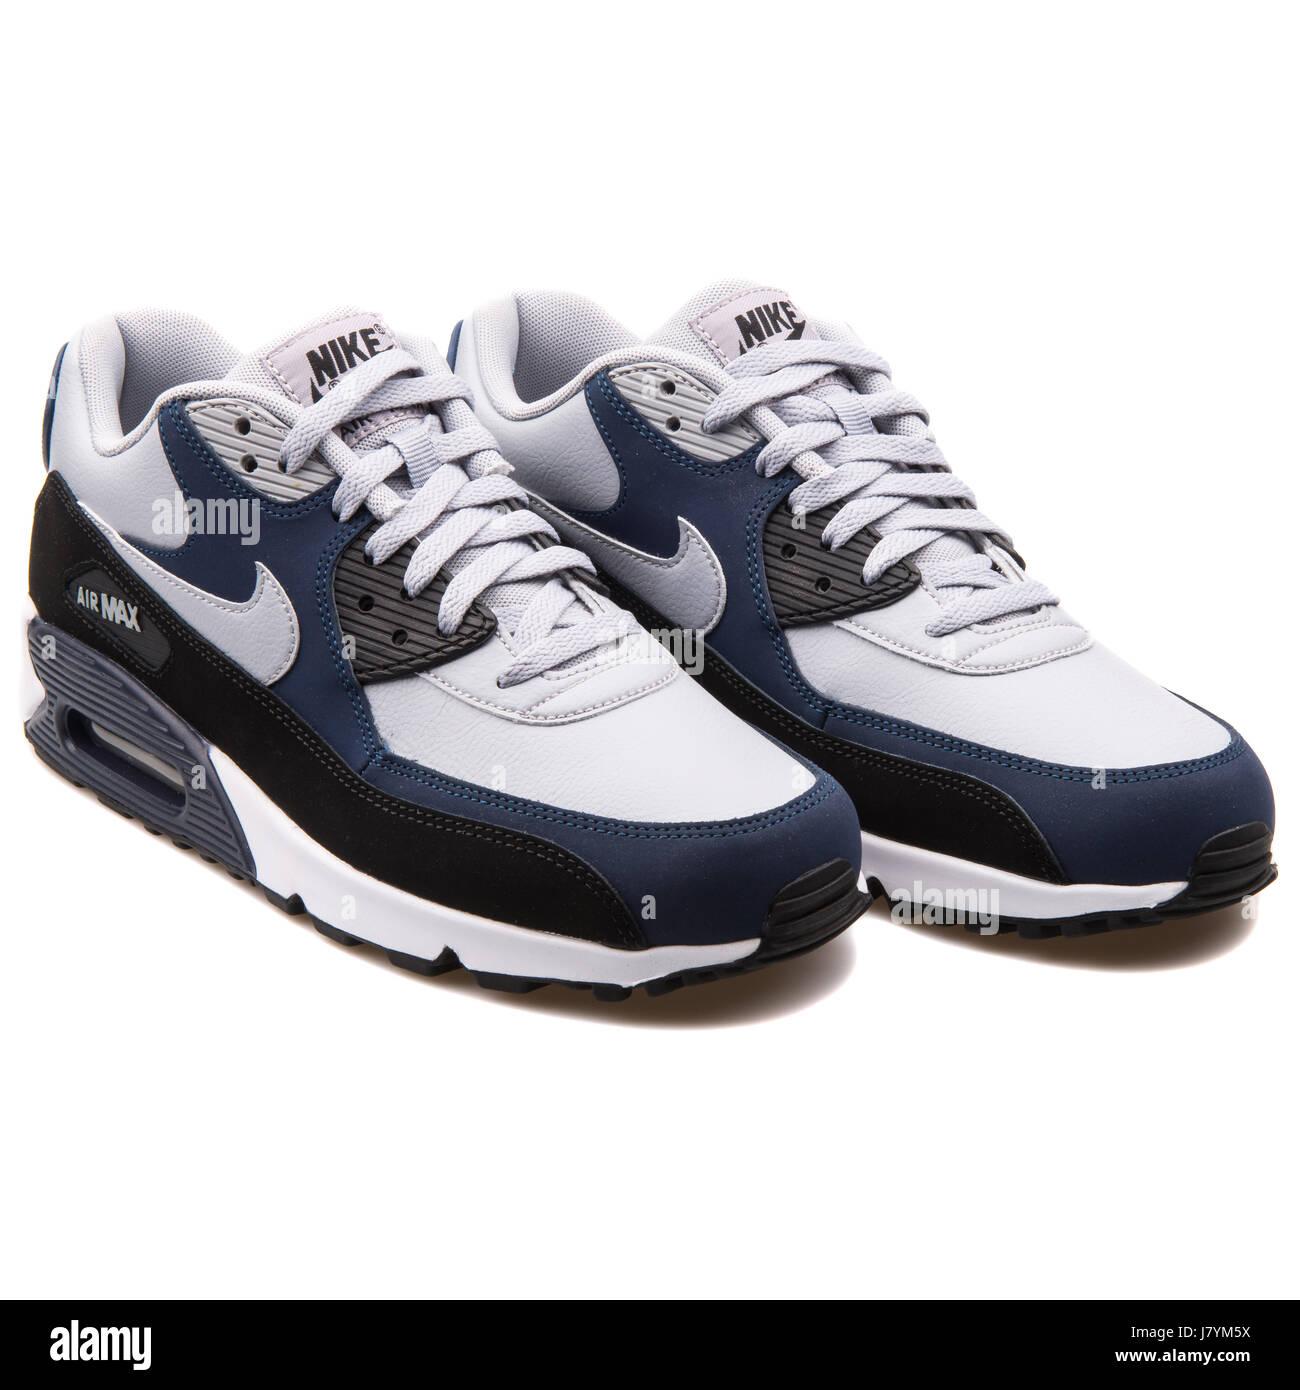 Nike Air Max 90 LTR Grey Navy Blue Men Sports Sneakers ...